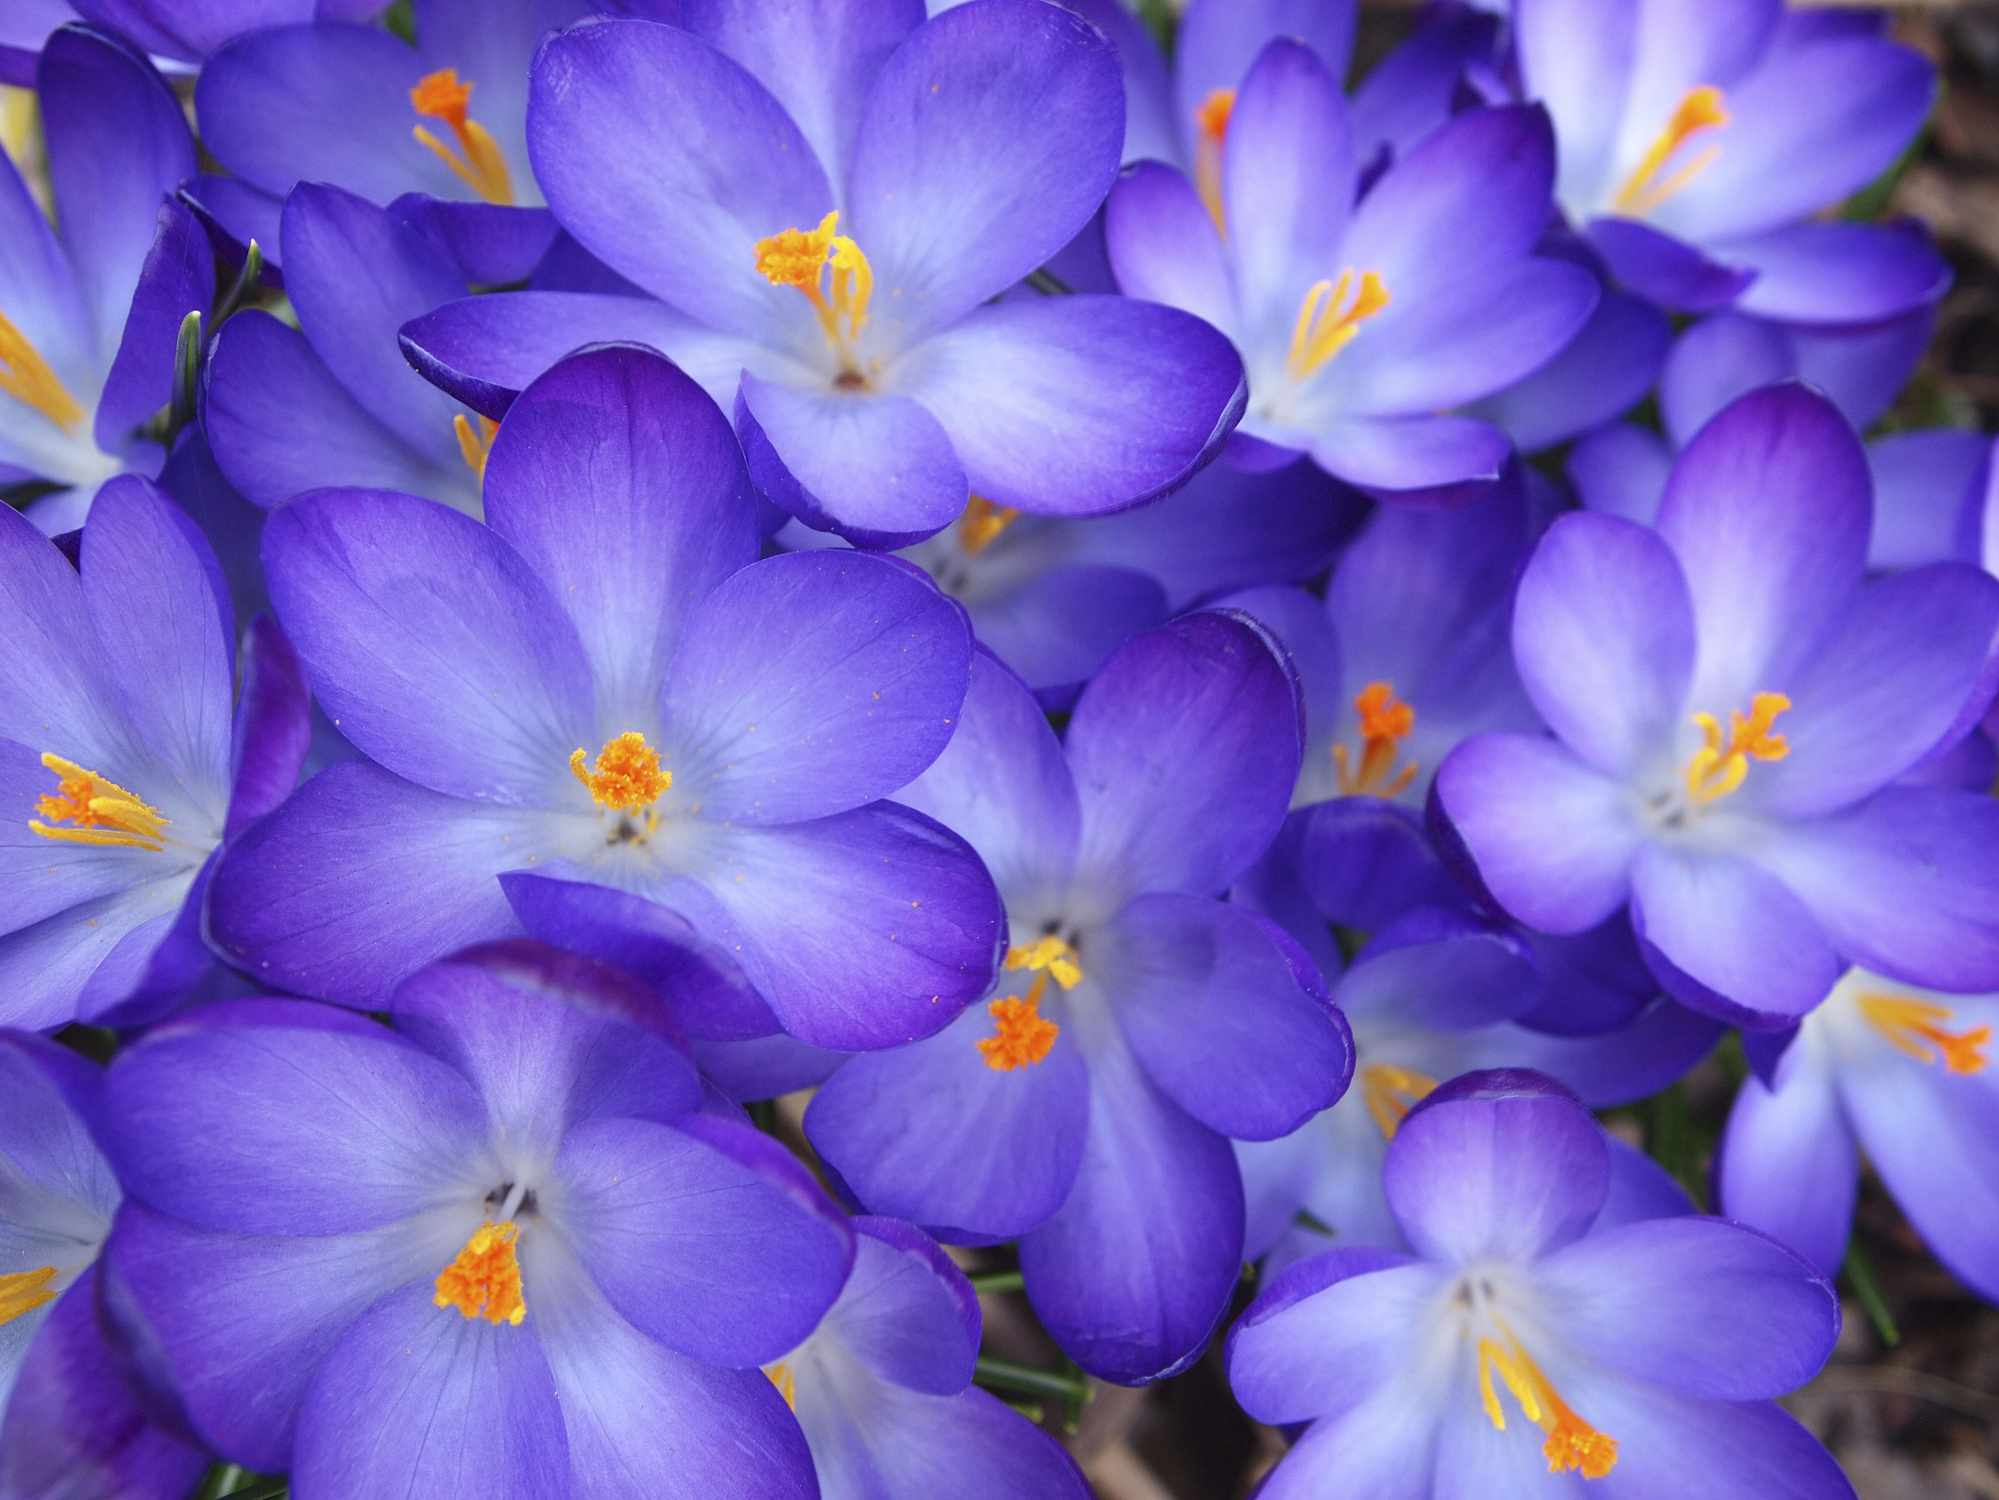 Saffron crocus with purple petals